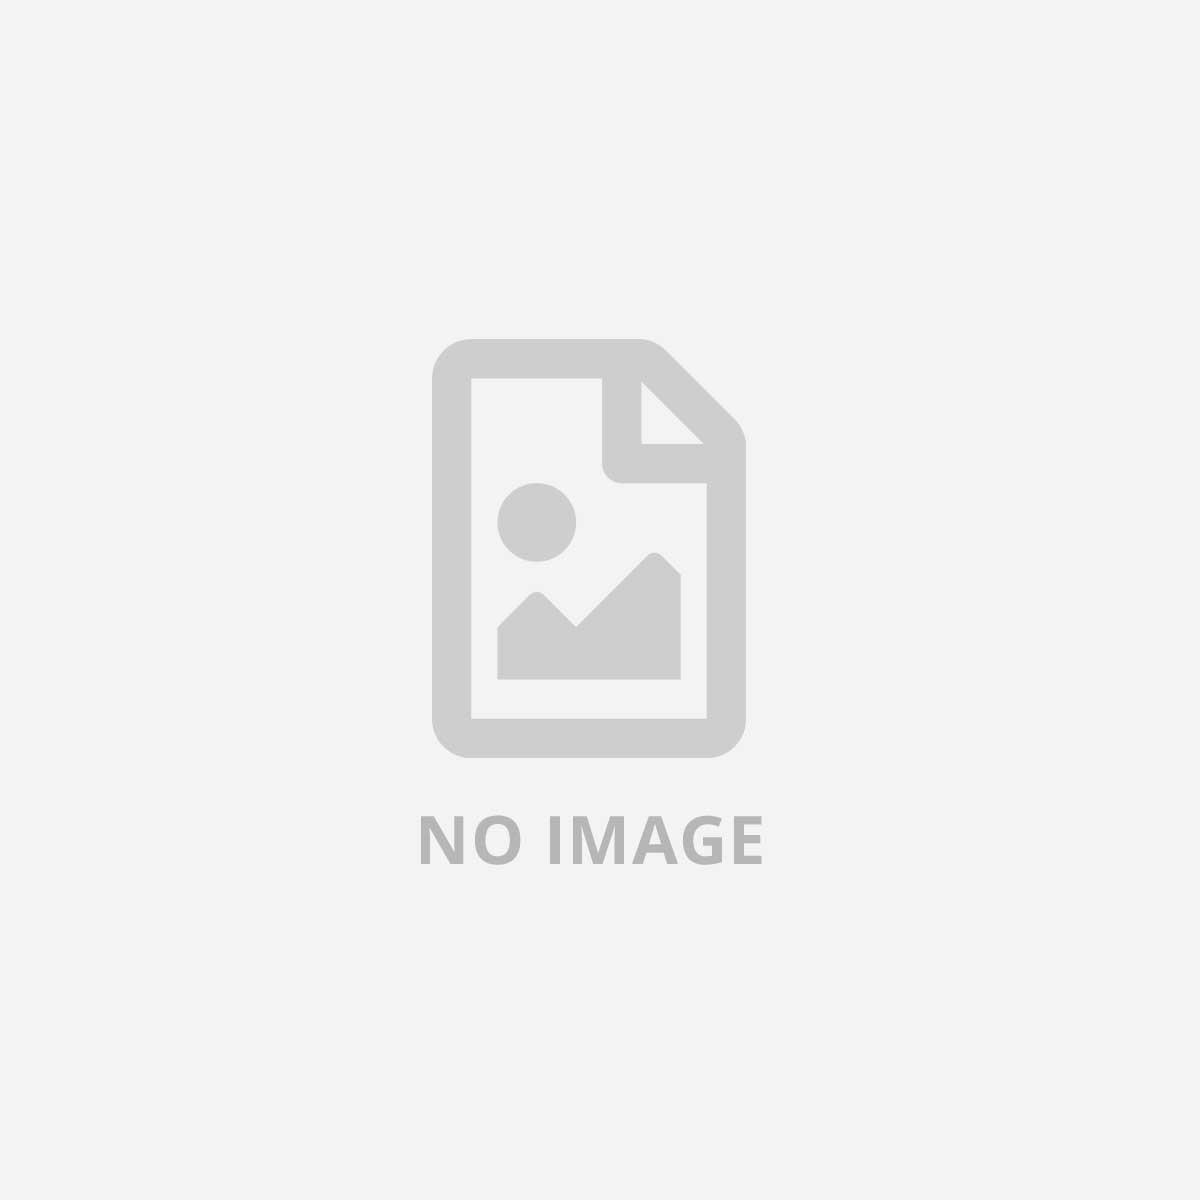 NILOX PCI EXP ADAPTER 3+1FIREWIRE PORTS